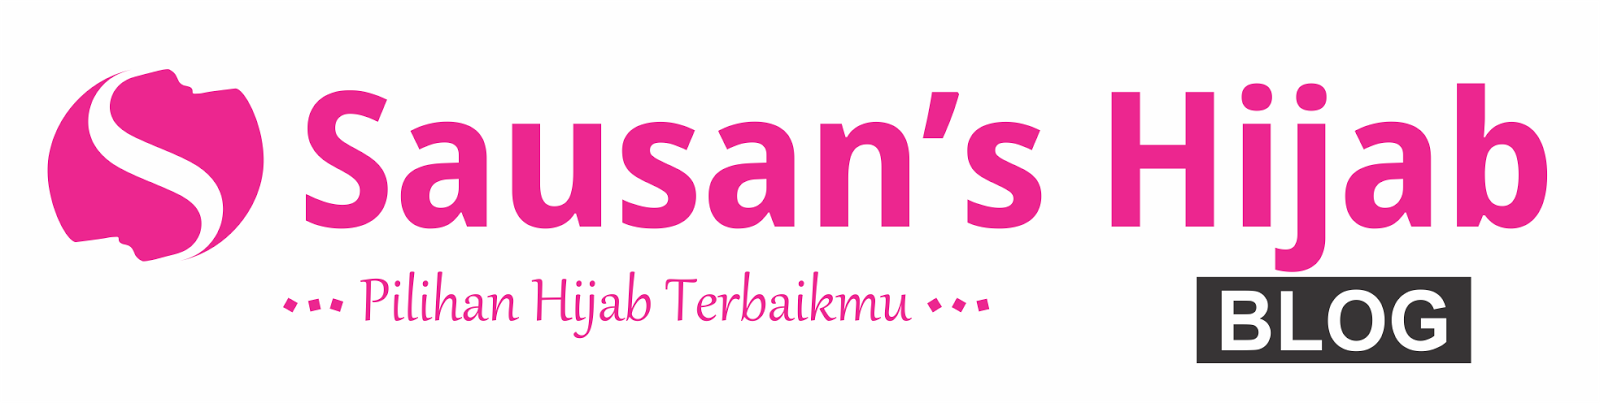 Jilbab Bekasi | Pilihan Hijab Terbaik di Bekasi